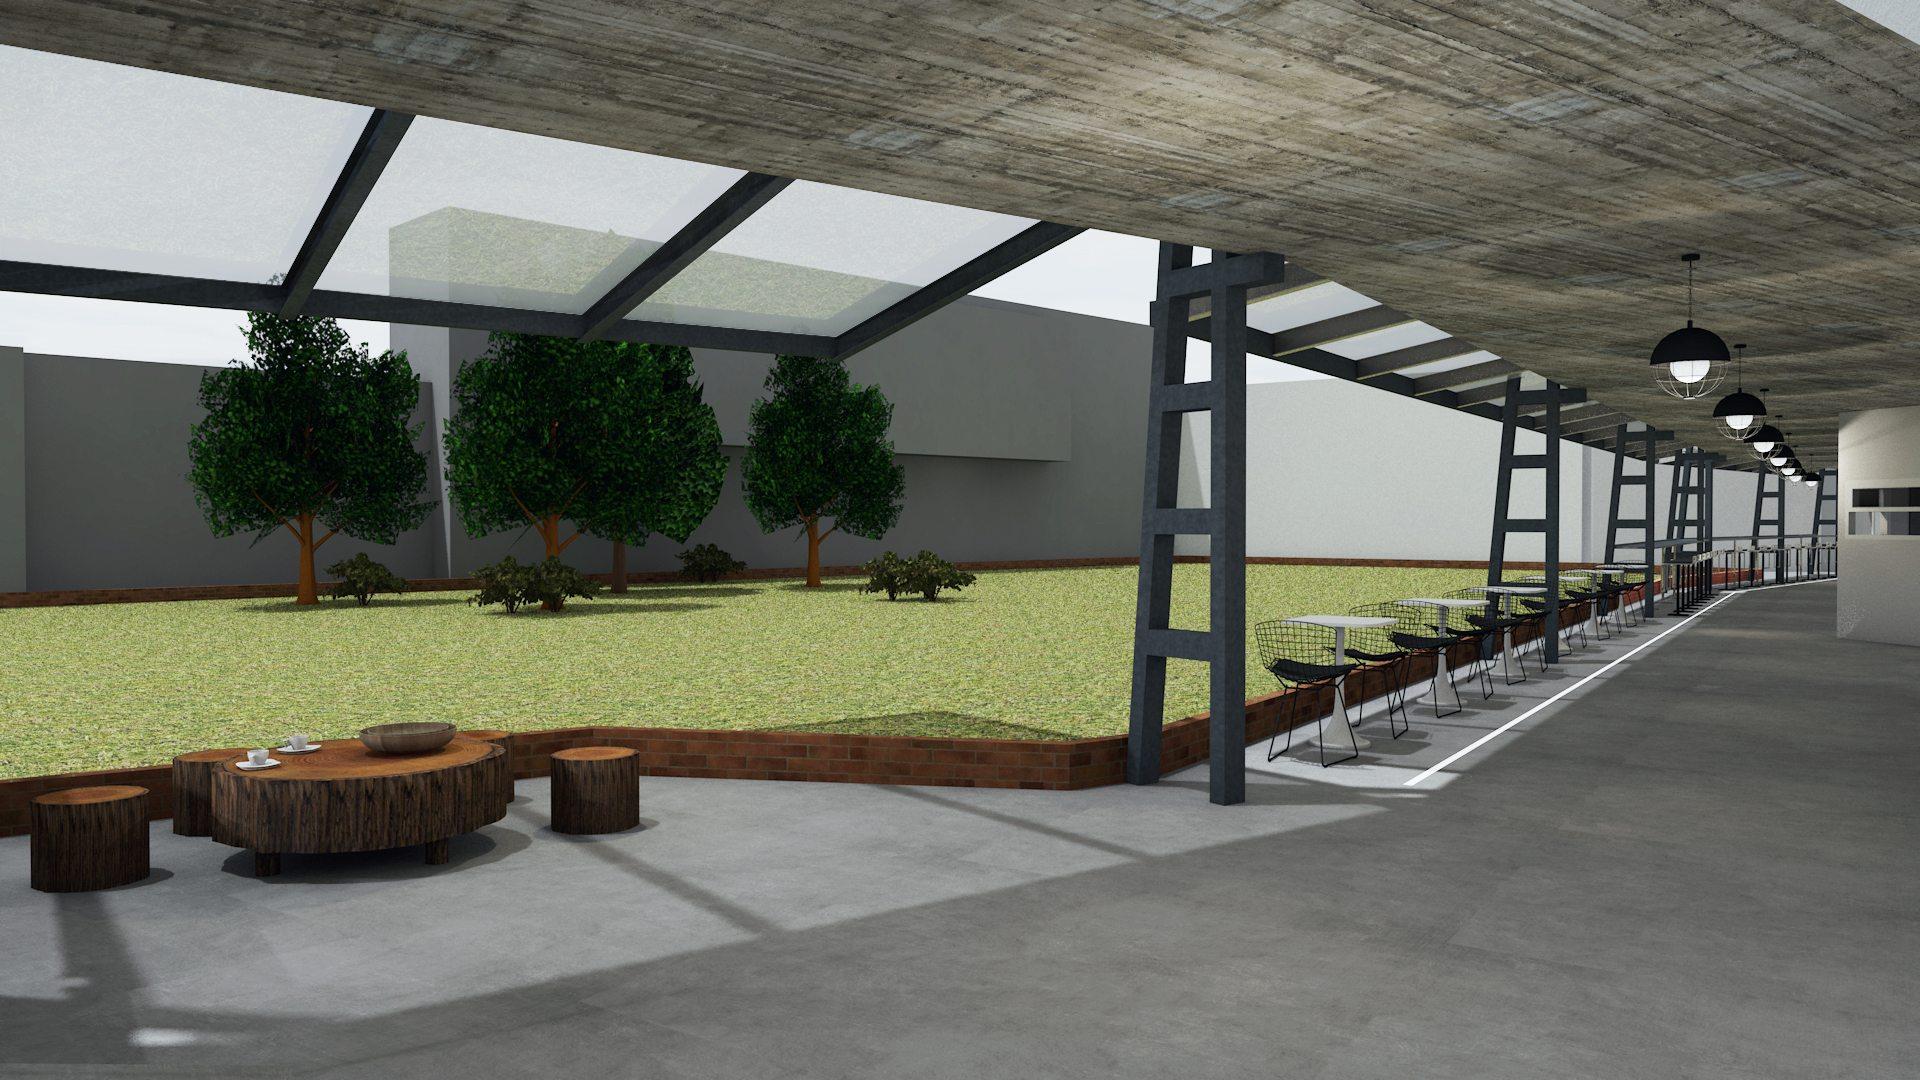 archicostudio_hospital-cafe_corridor-1